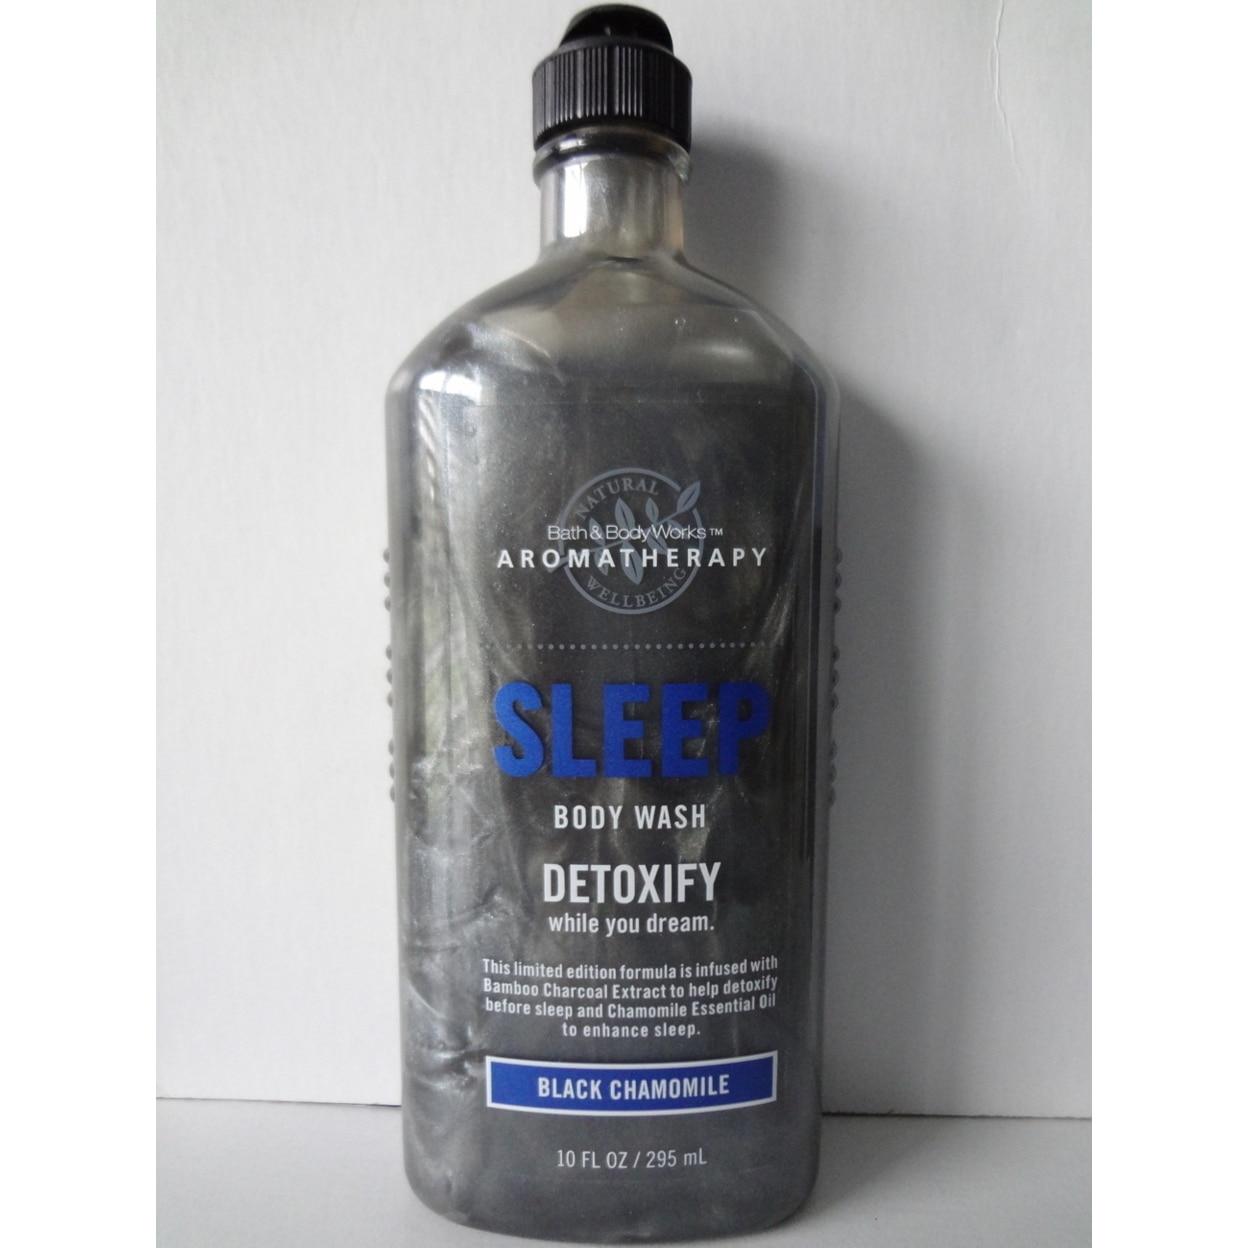 Bath & Body Works Aromatherapy BLACK CHAMOMILE Sleep Body Wash Detoxify 10 fl oz